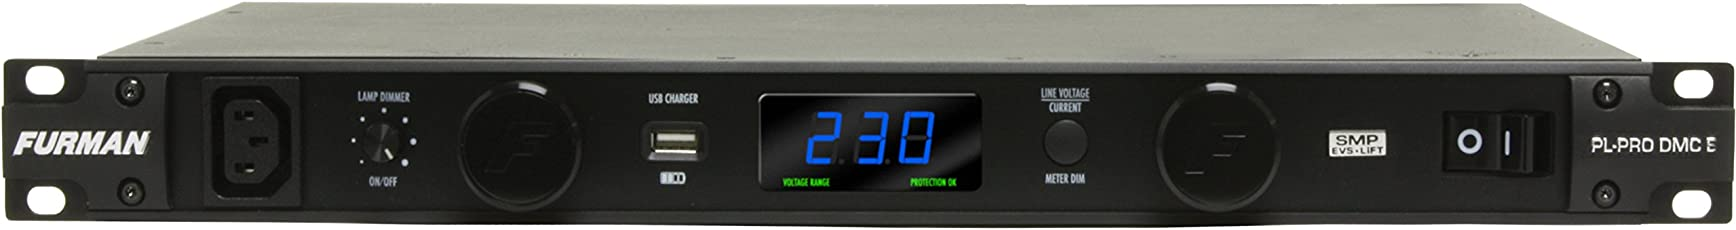 Furman Classic Series PL-PRO DMC E 16-Amps Power Conditioner